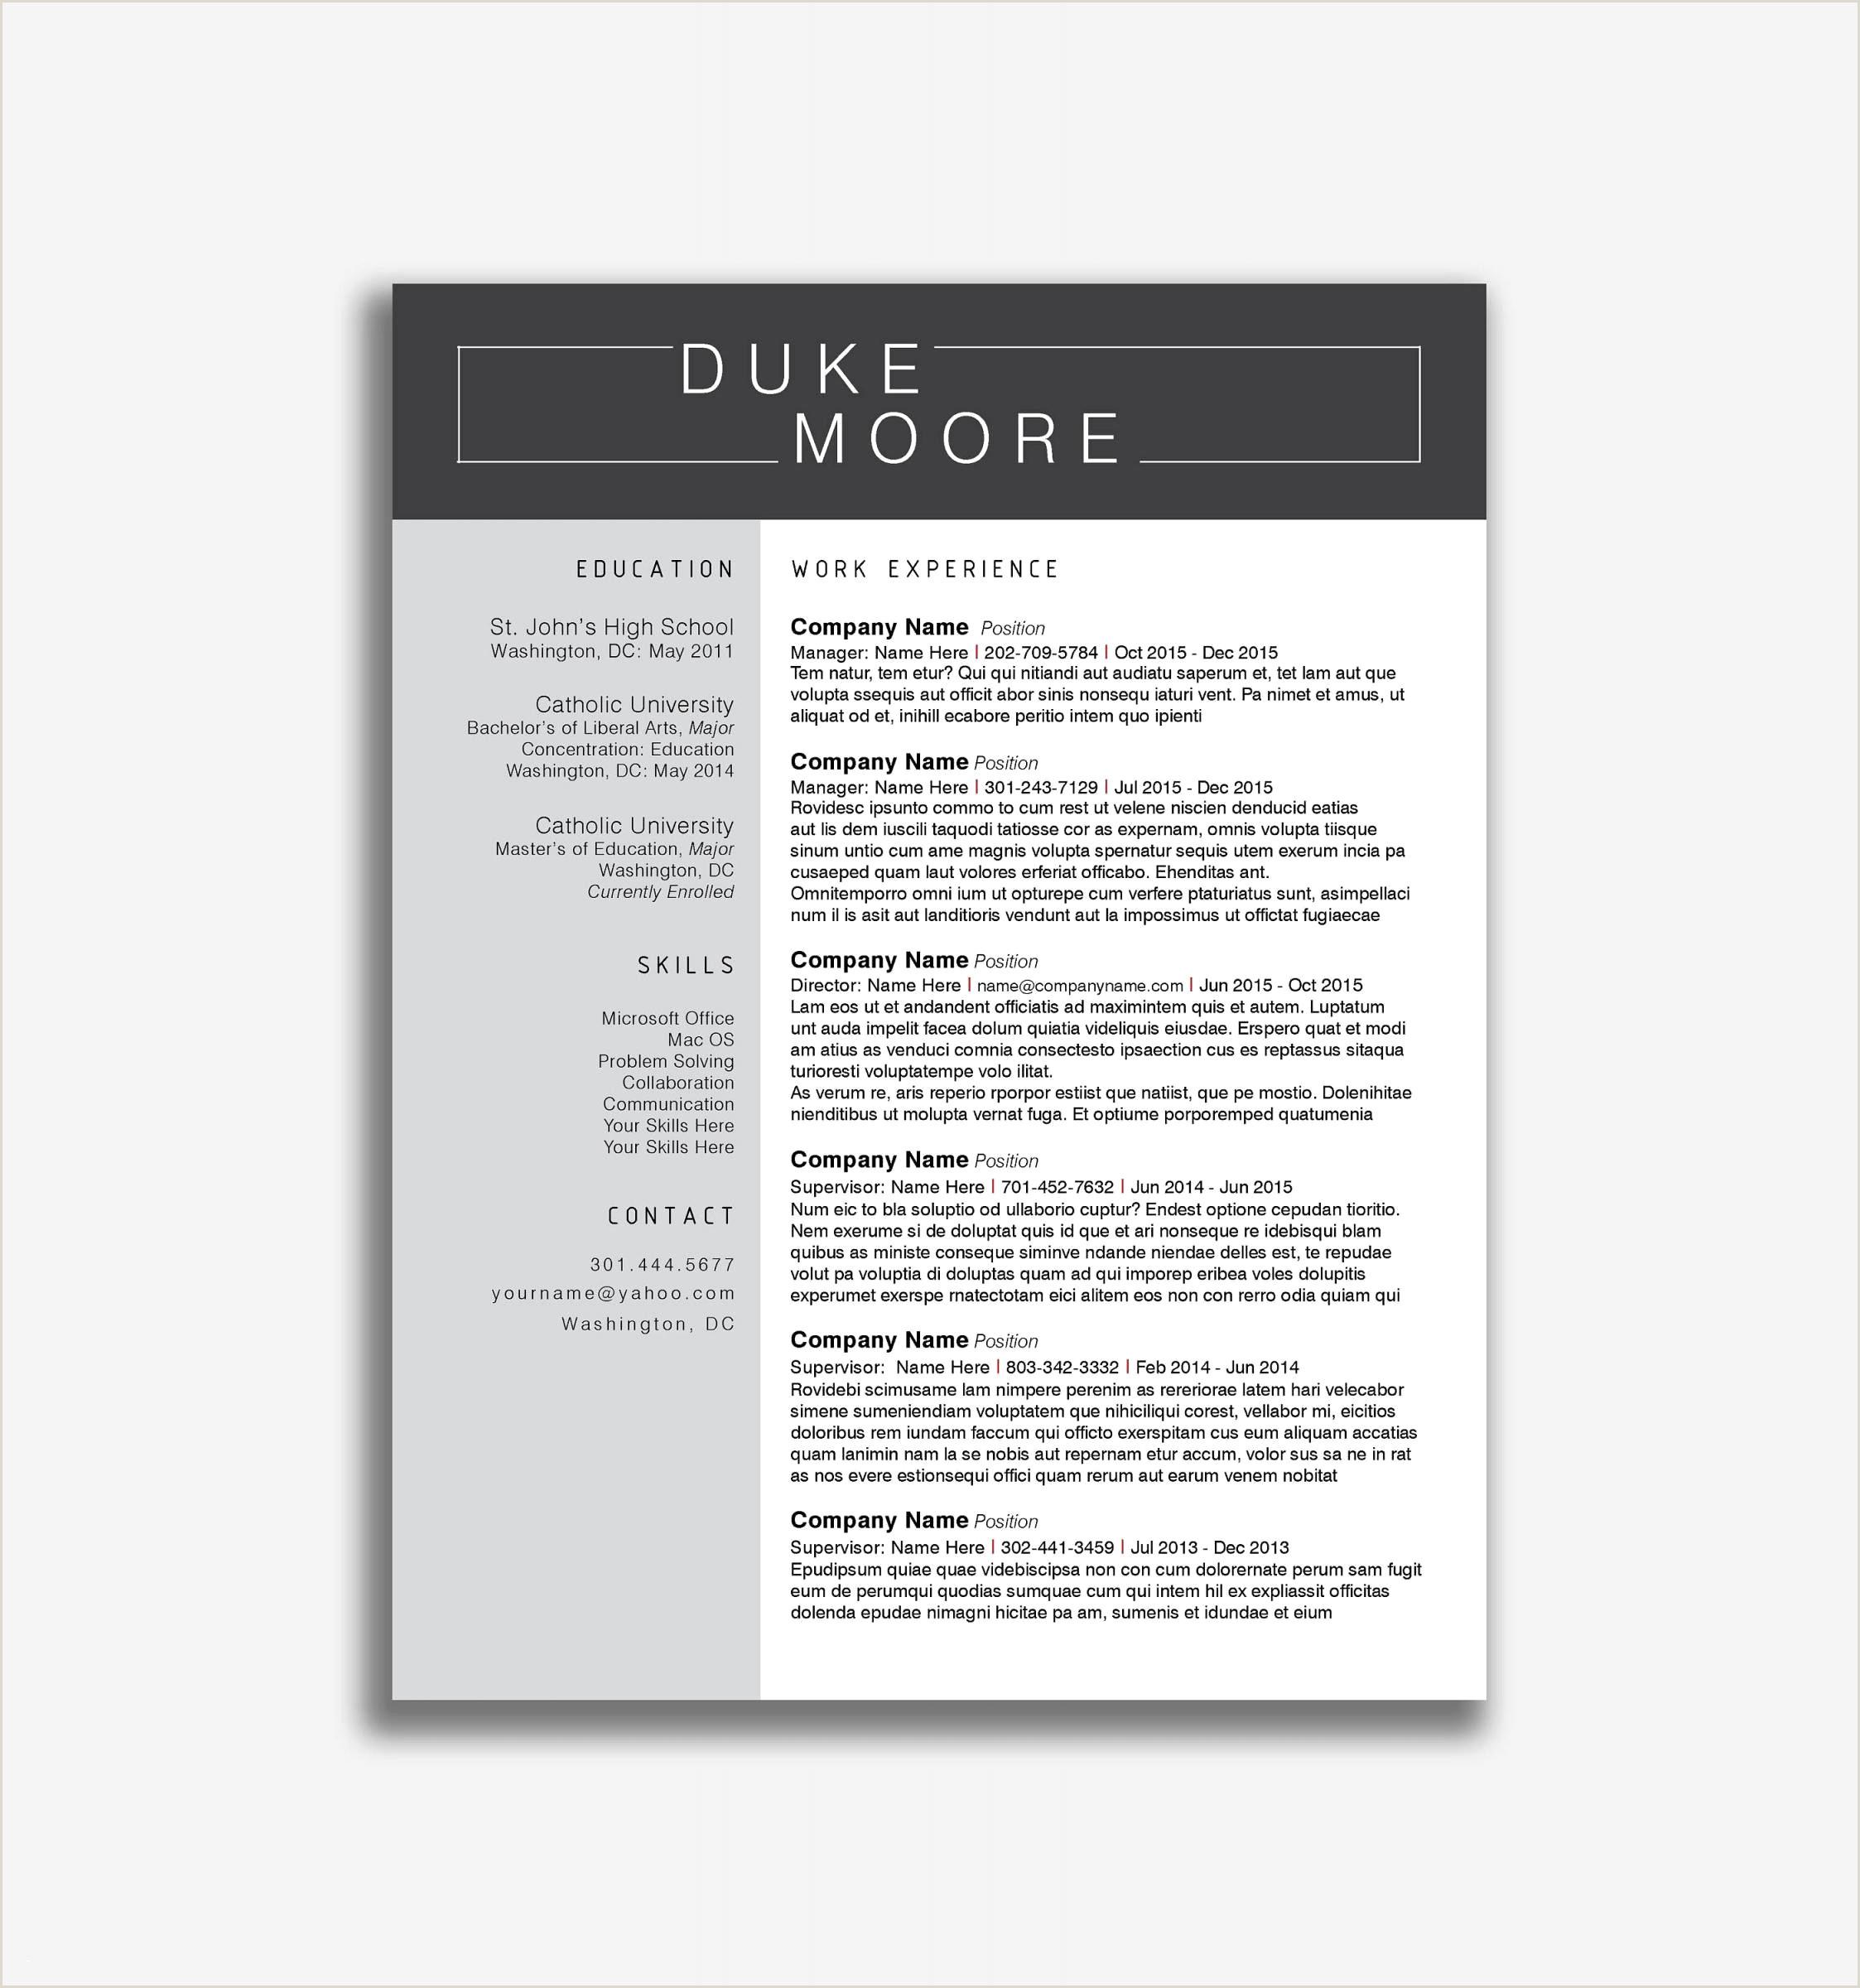 Lebenslauf Muster Download Kostenlos Template Cv Gratuit Exemple Lebenslauf Vorlage Libreoffice